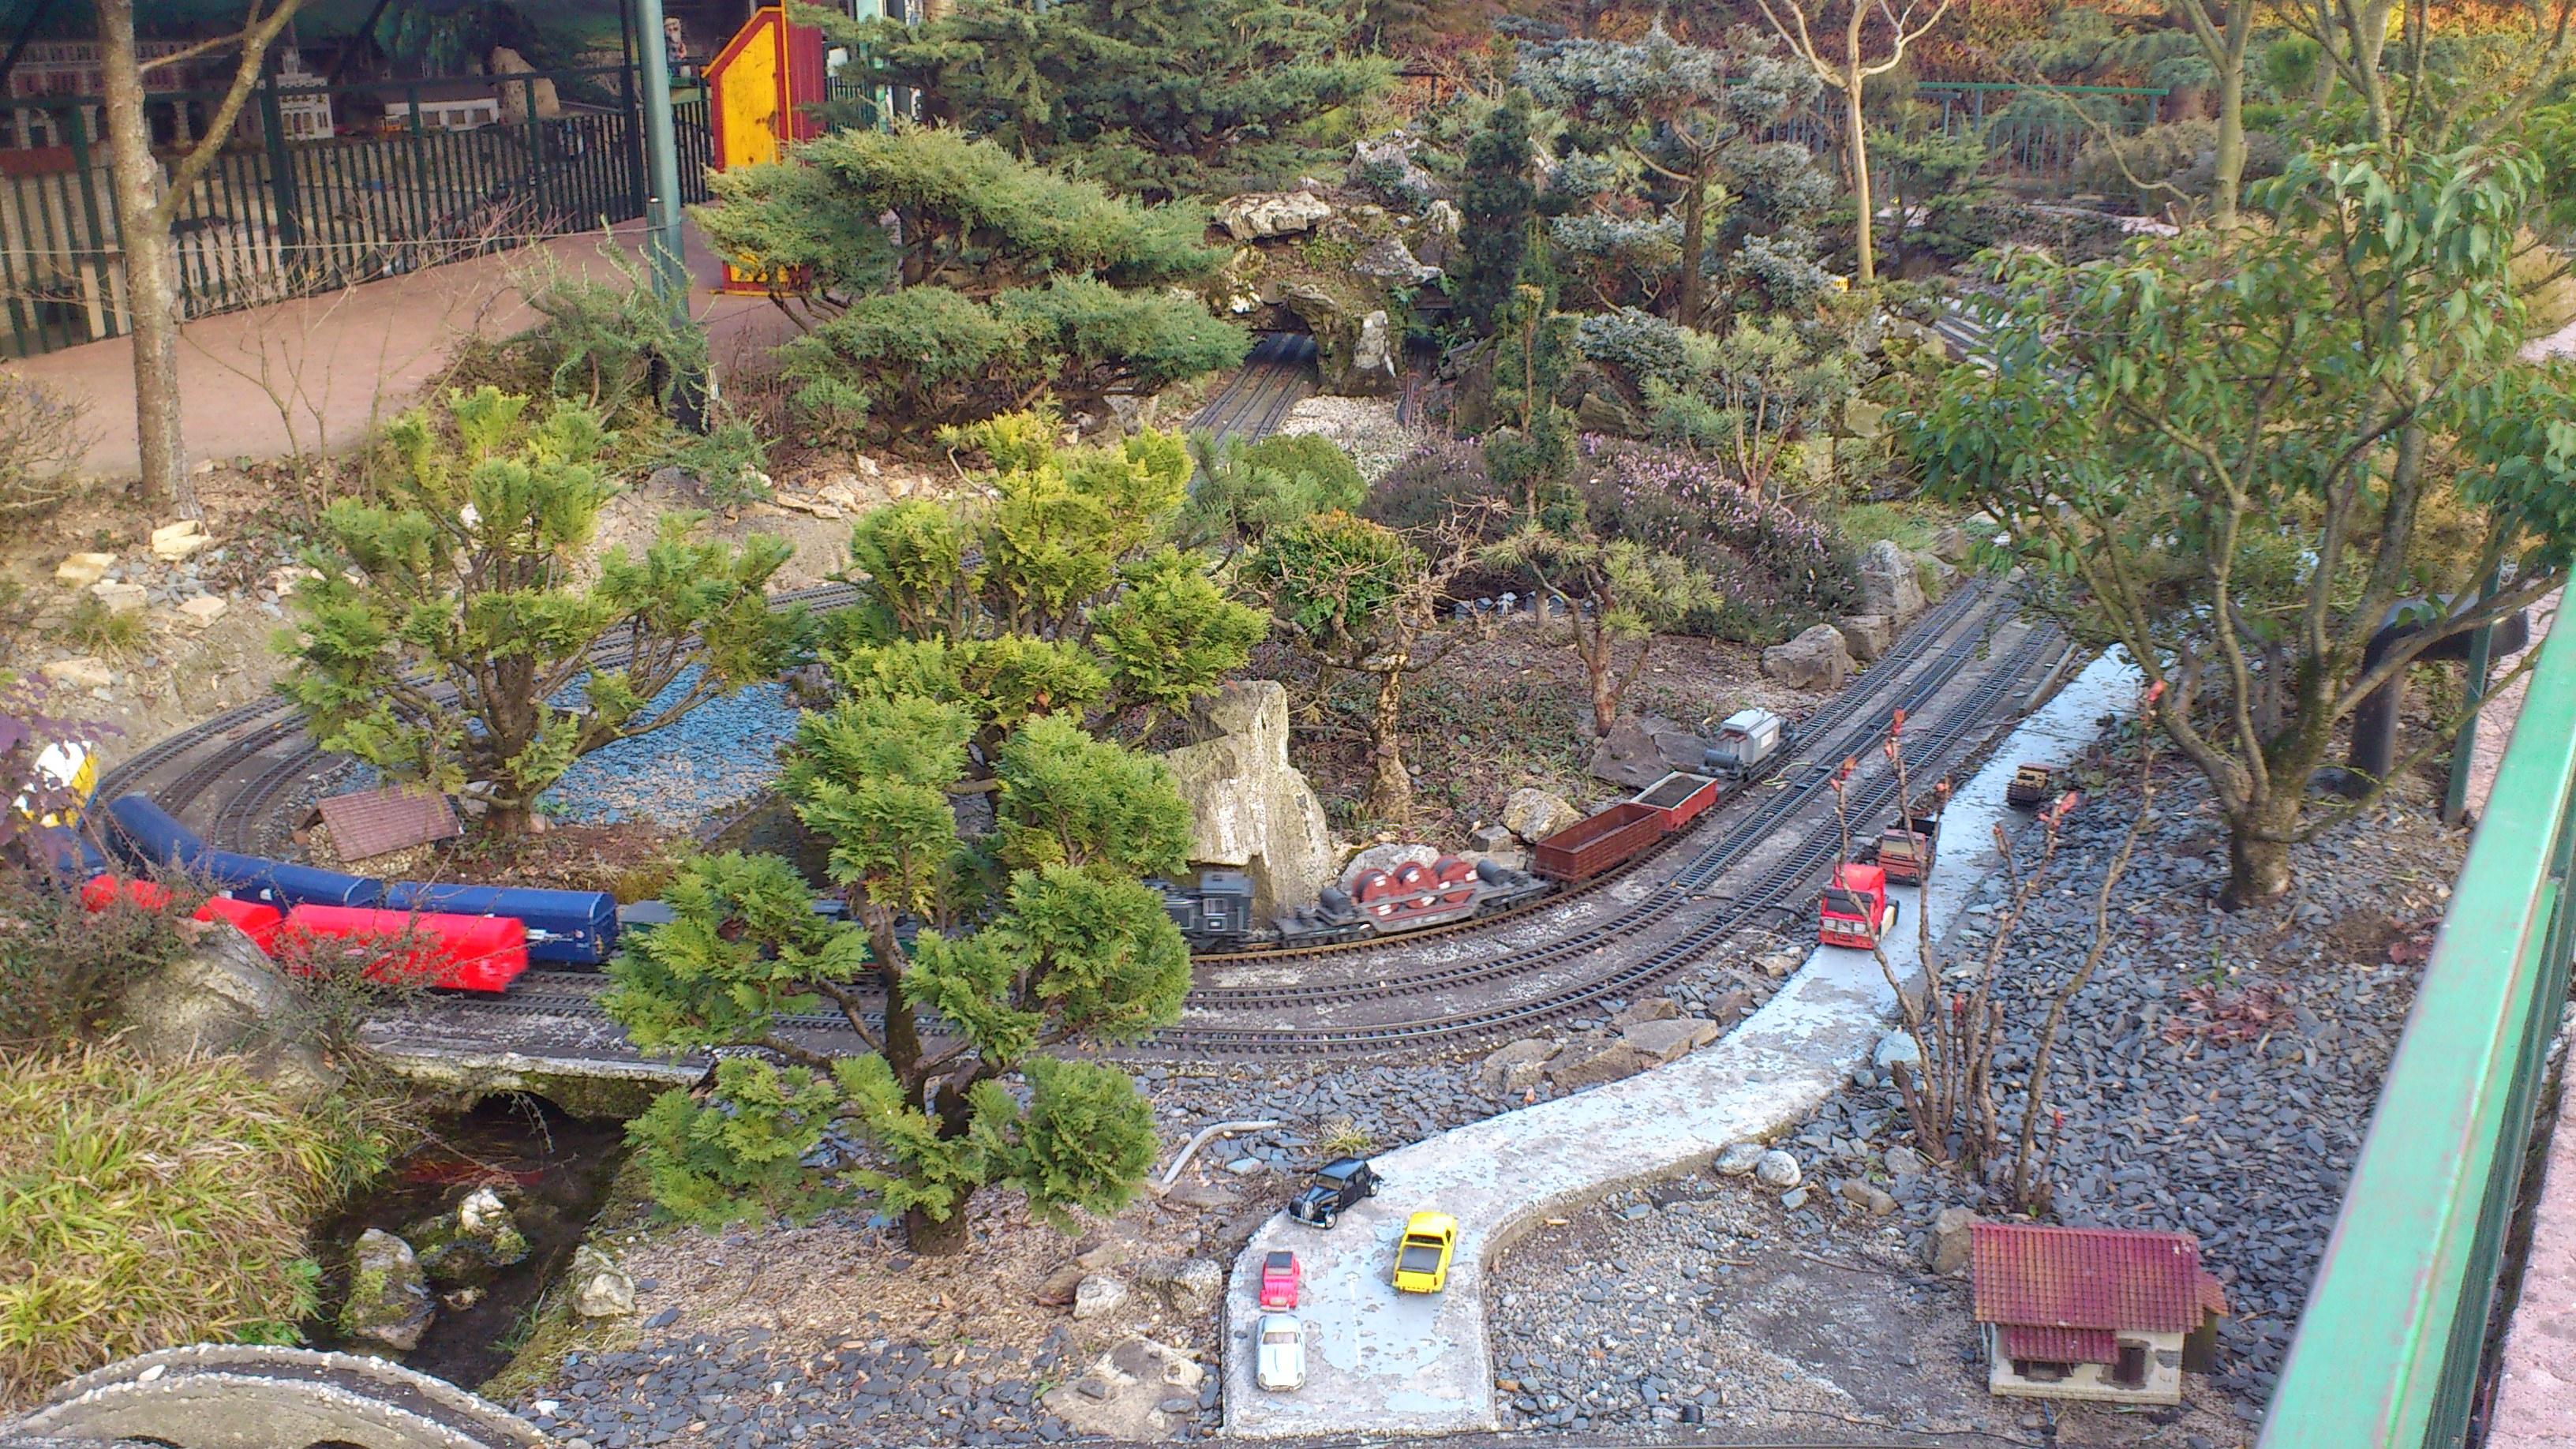 Le jardin ferroviaire chatte for Jardin ferroviaire